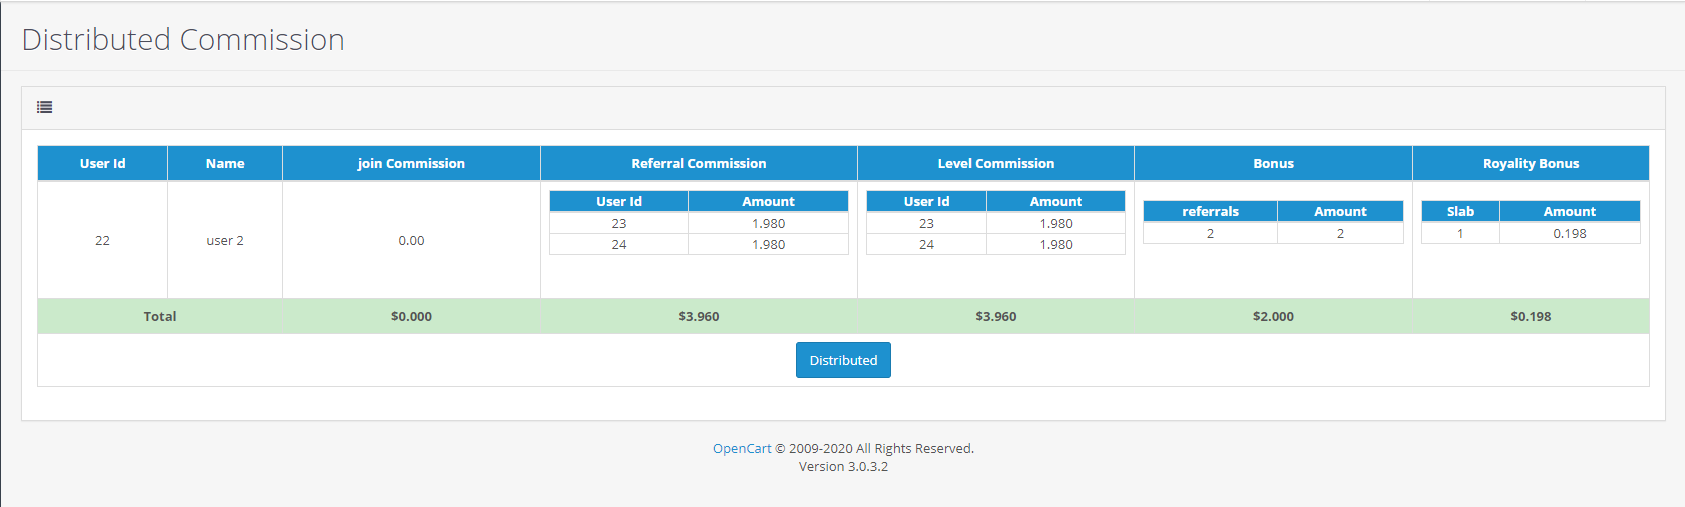 |'Opencart'| |'letscms'| |'opencart unilevel mlm plan'| |'distribute commission'| |'commission'| |'distribute'| |'Dashboard'| |'unilevel mlm plan'| |'mlm'| |'mlm Plan'|  |'setting'| |'new users'| |'unilevel'| |'unilevel mlm extension'| |'costomer list'| |'new users'| |'Installer'| |'mlmtrees.com'| |'mlm plan'| |'extension'| |'Opencart mlm plan'|